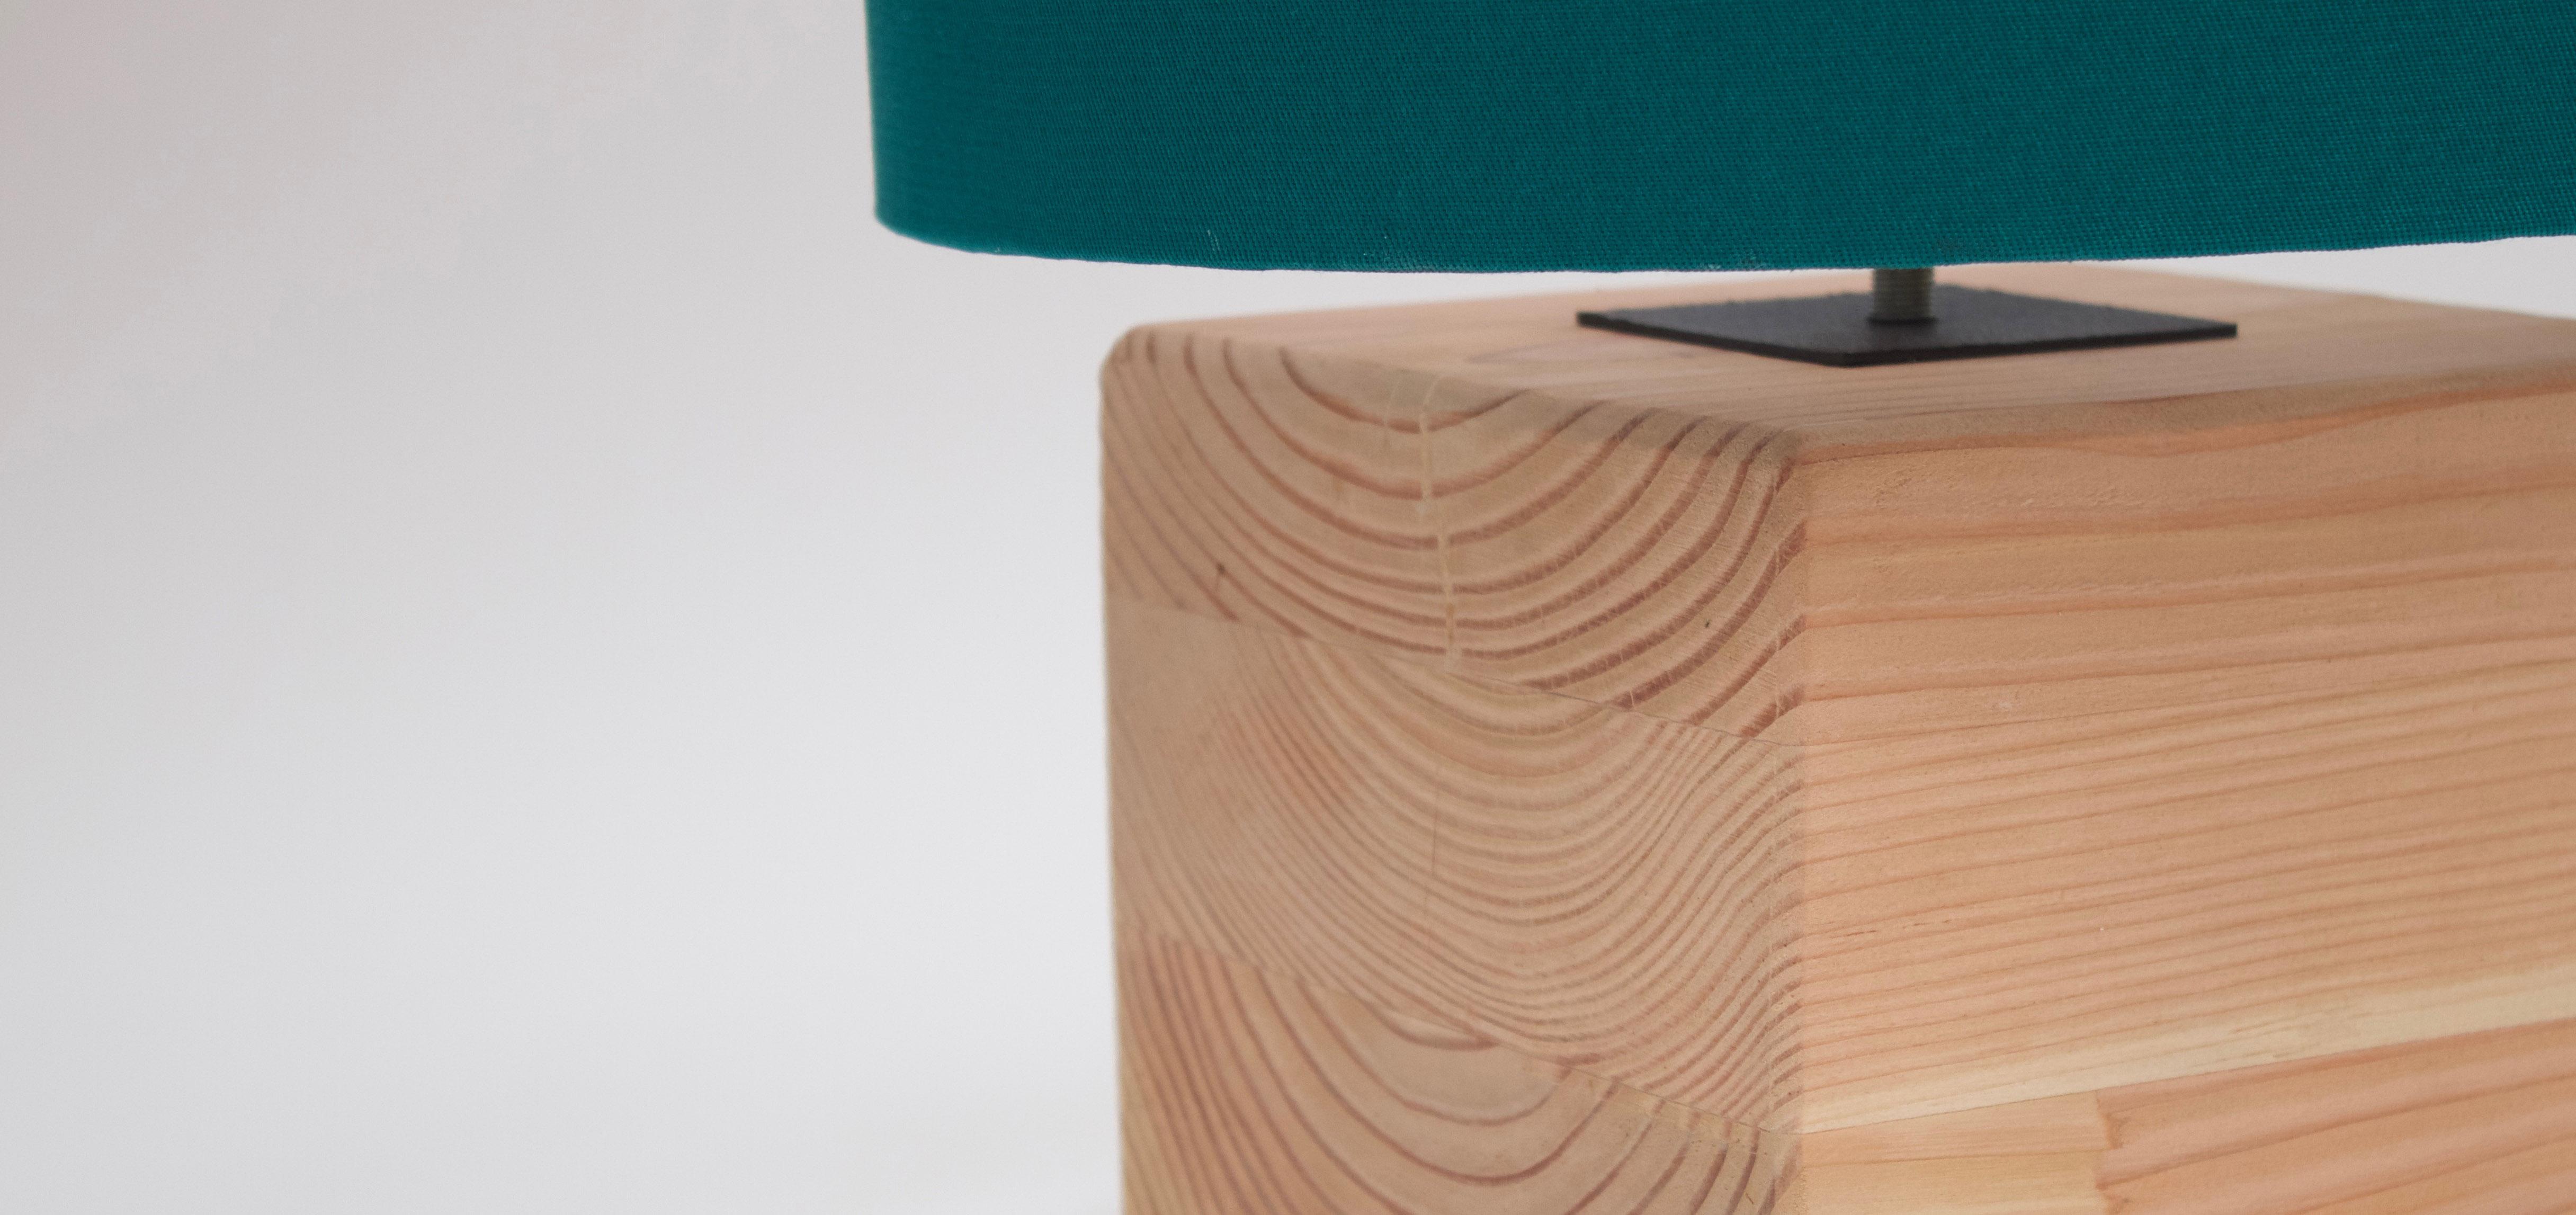 woodaucarre - lampe cube